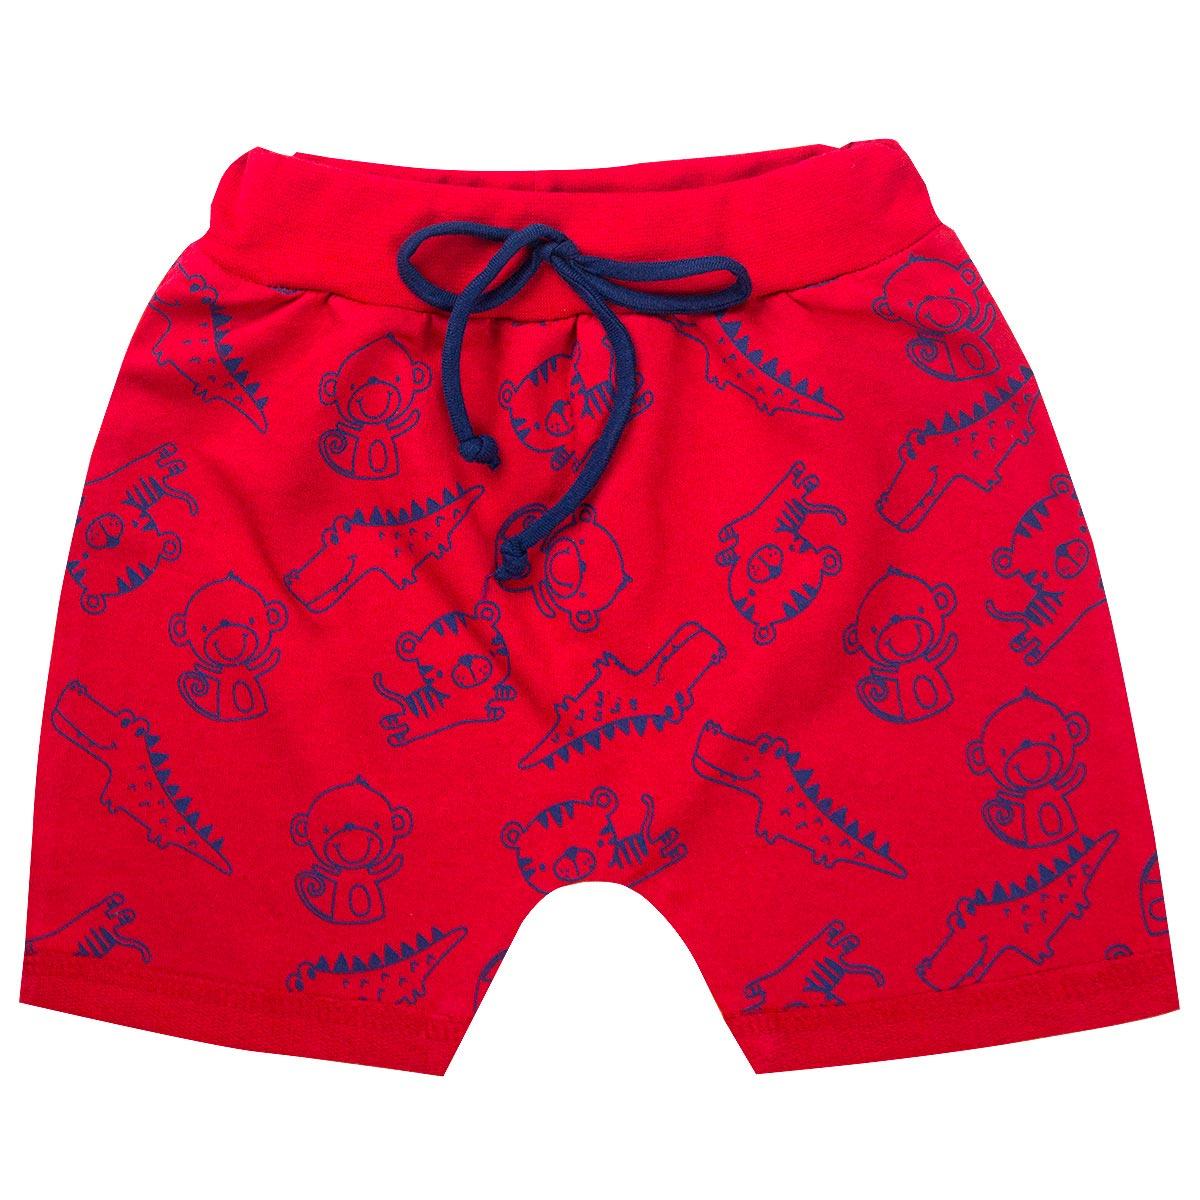 Bermuda Infantil Menino Estampada Saruel Vermelha Isensee